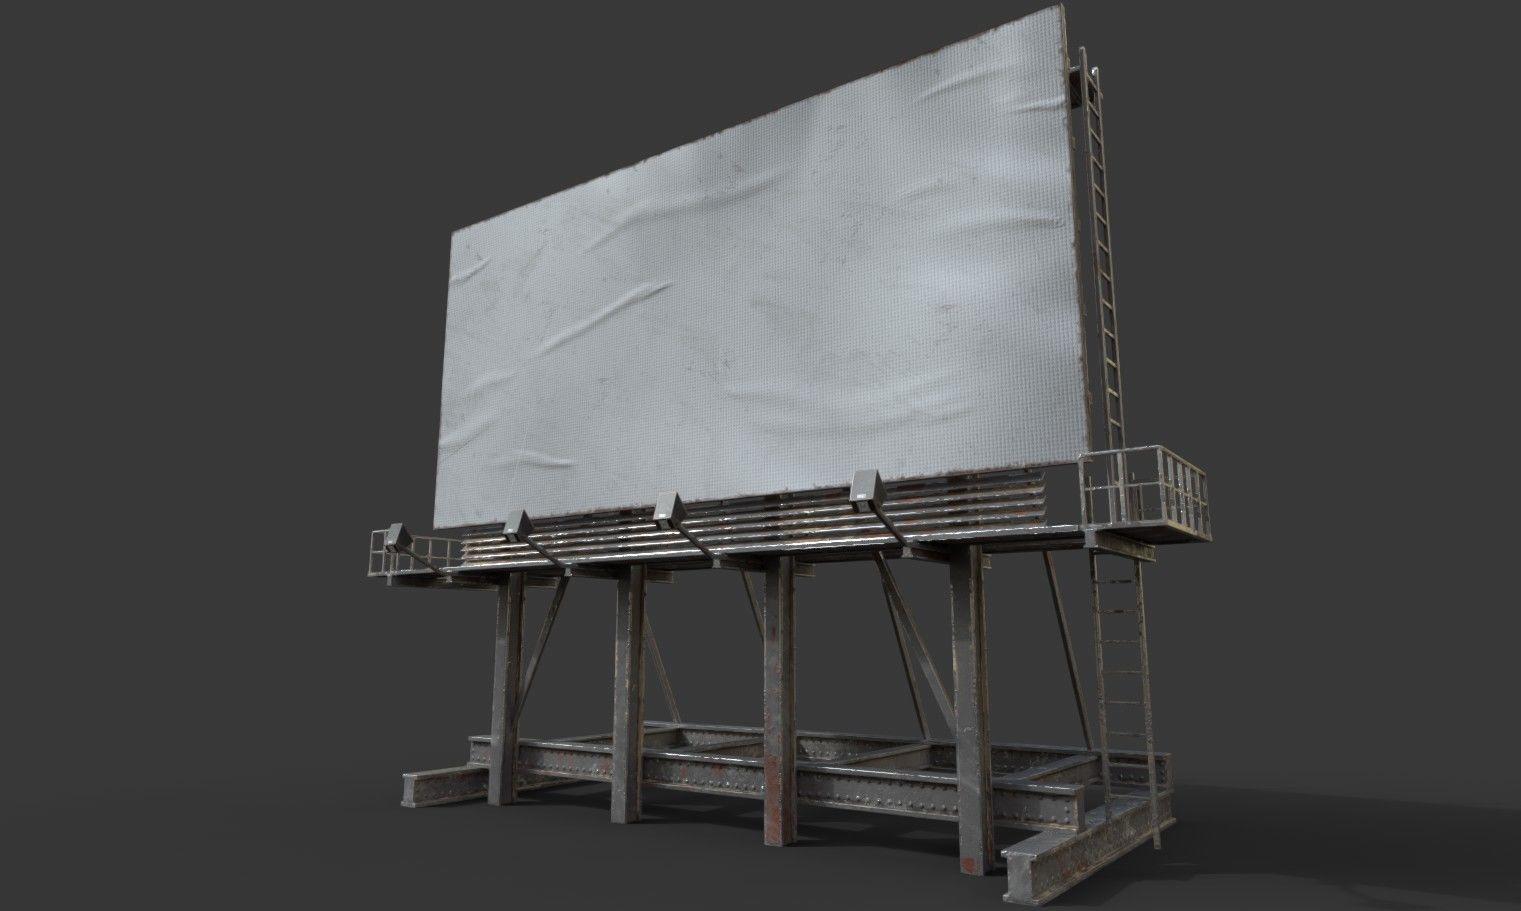 Rooftop Billboard model